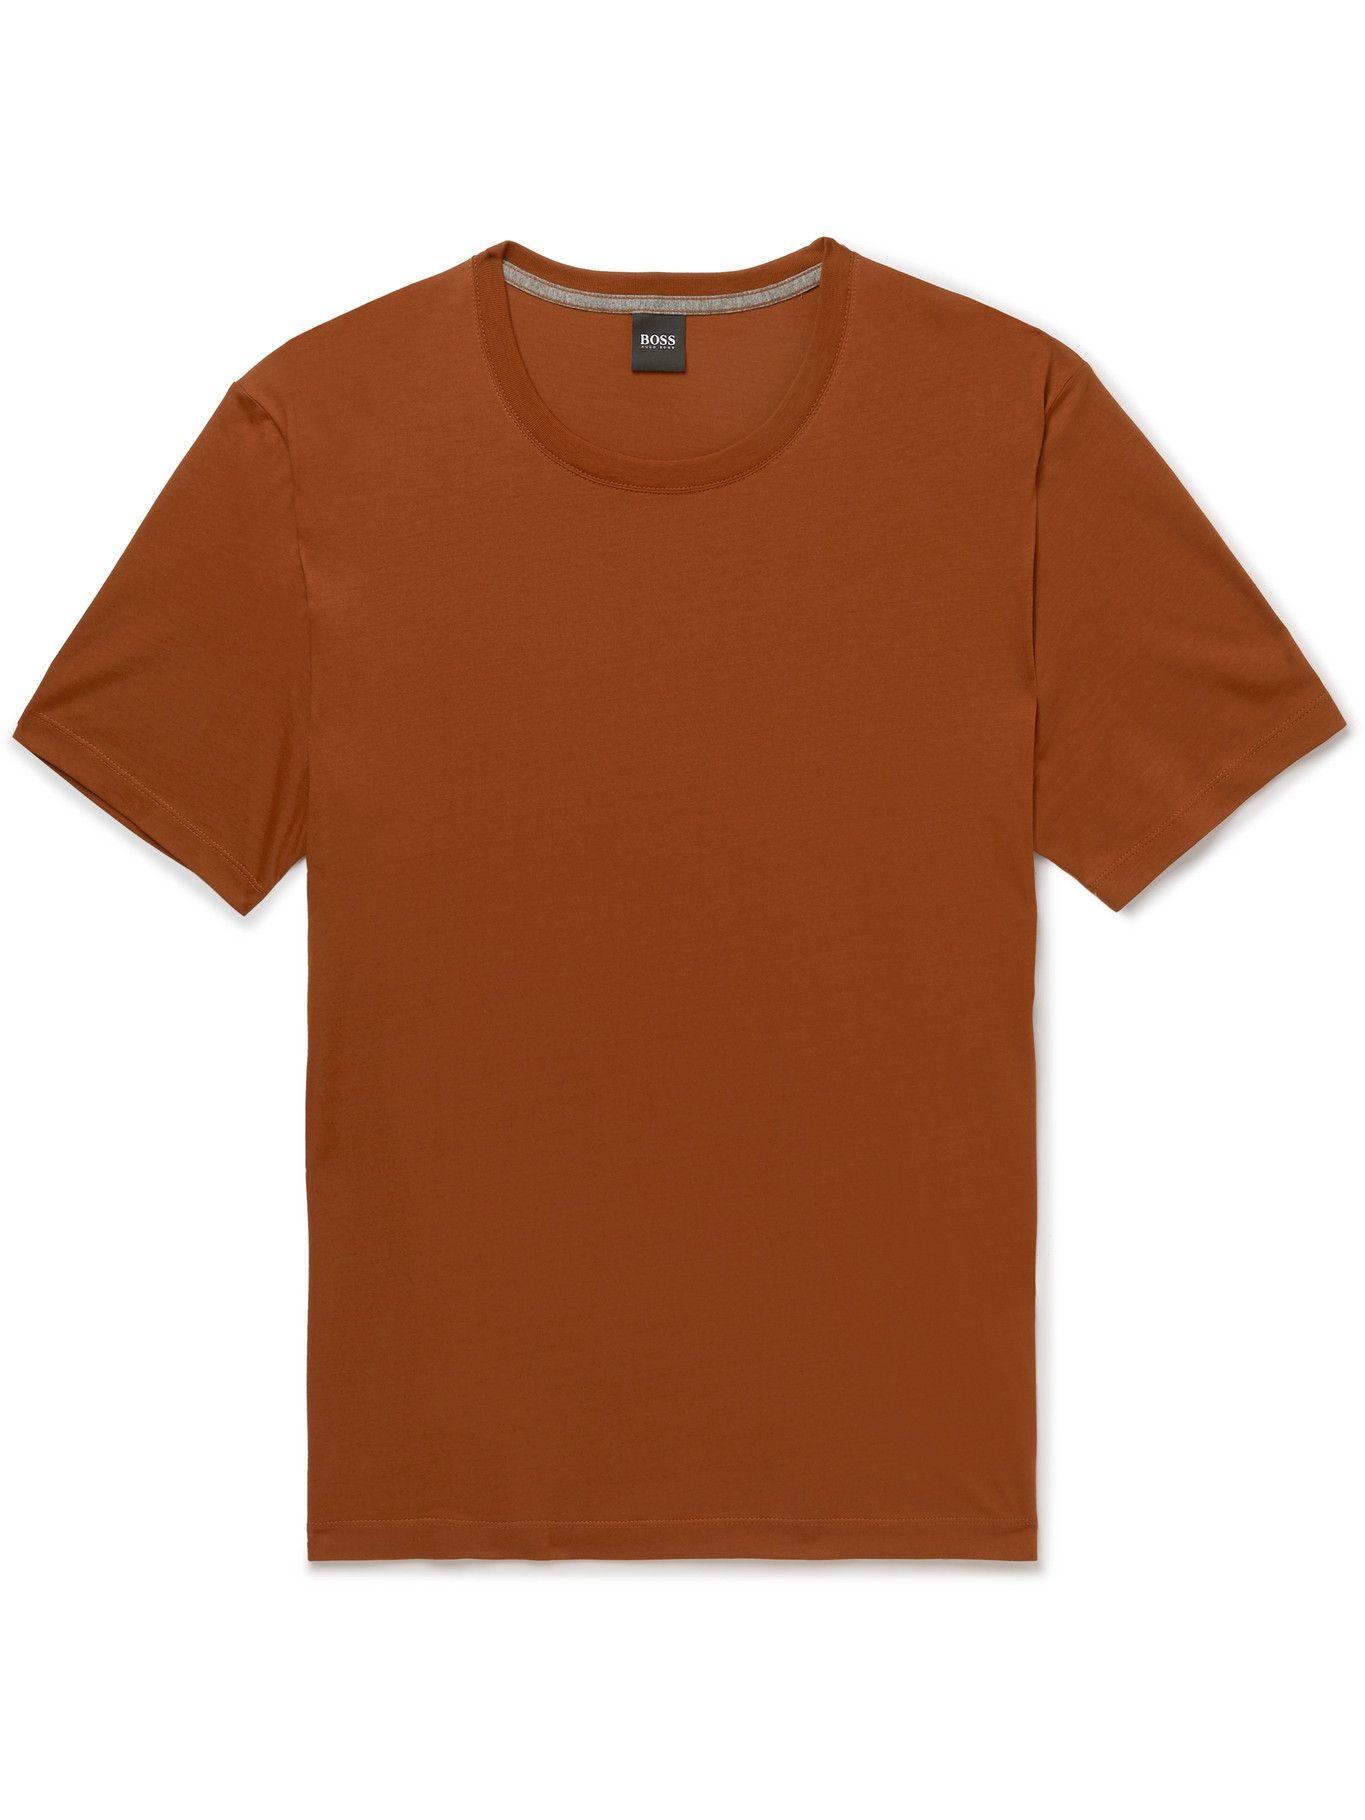 HUGO BOSS - Slim-Fit Cotton-Jersey T-Shirt - Unknown